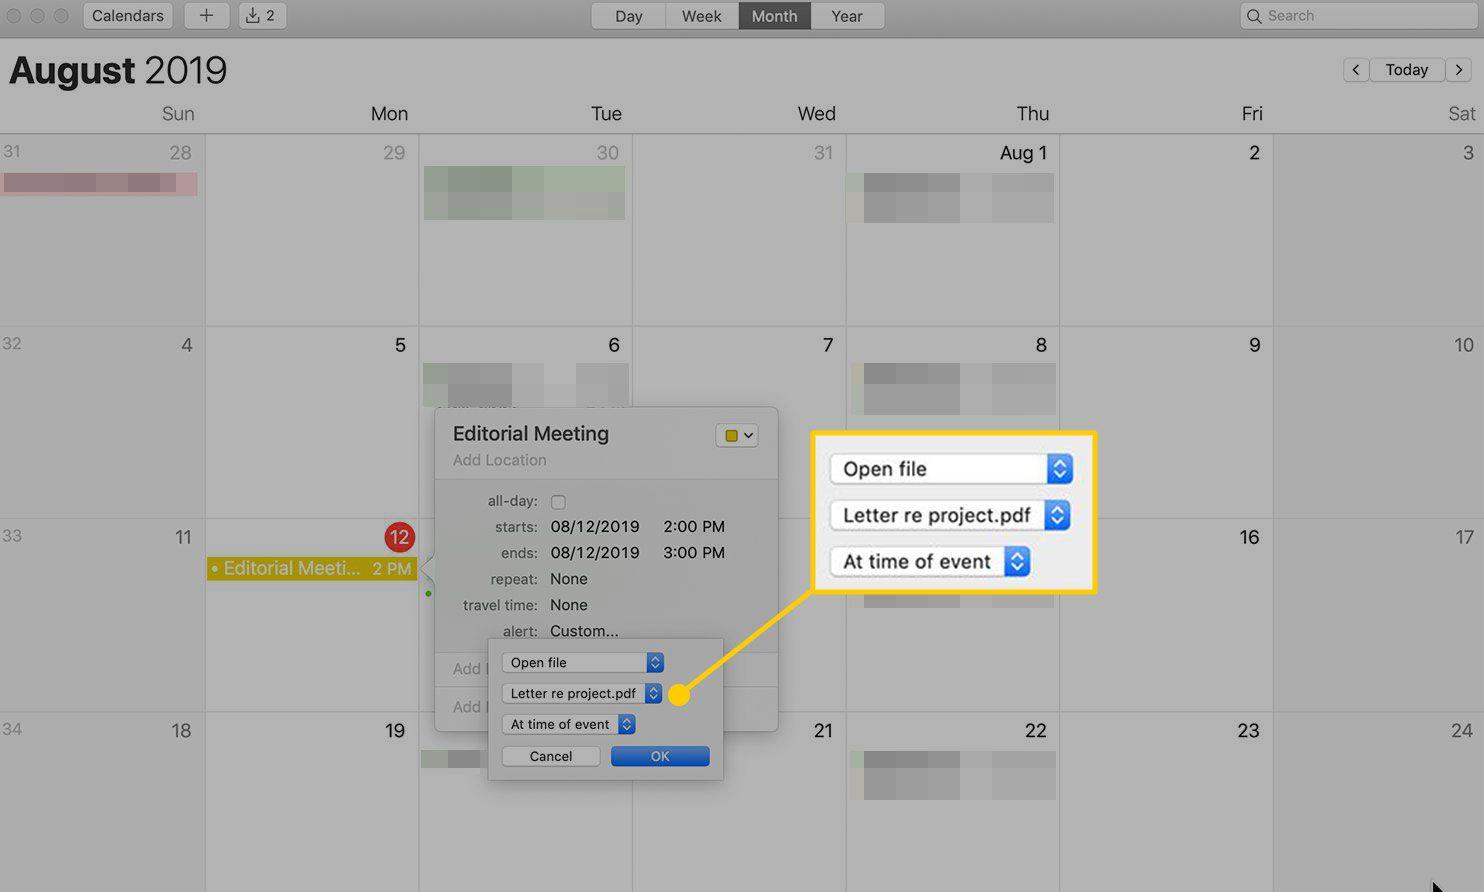 Attaching a file to an alert in Calendar